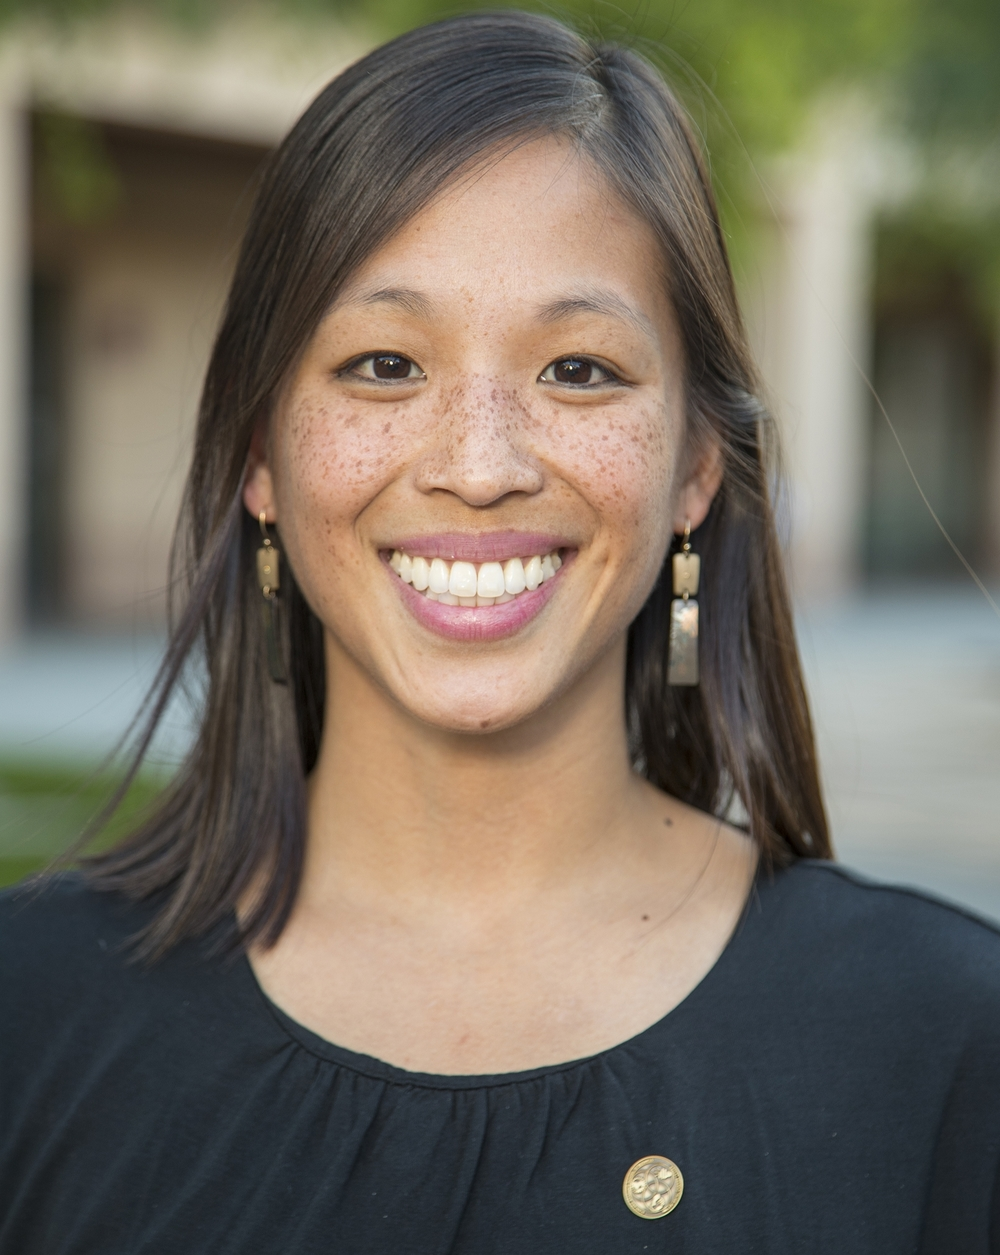 Alina Liao, Co-founder & COO